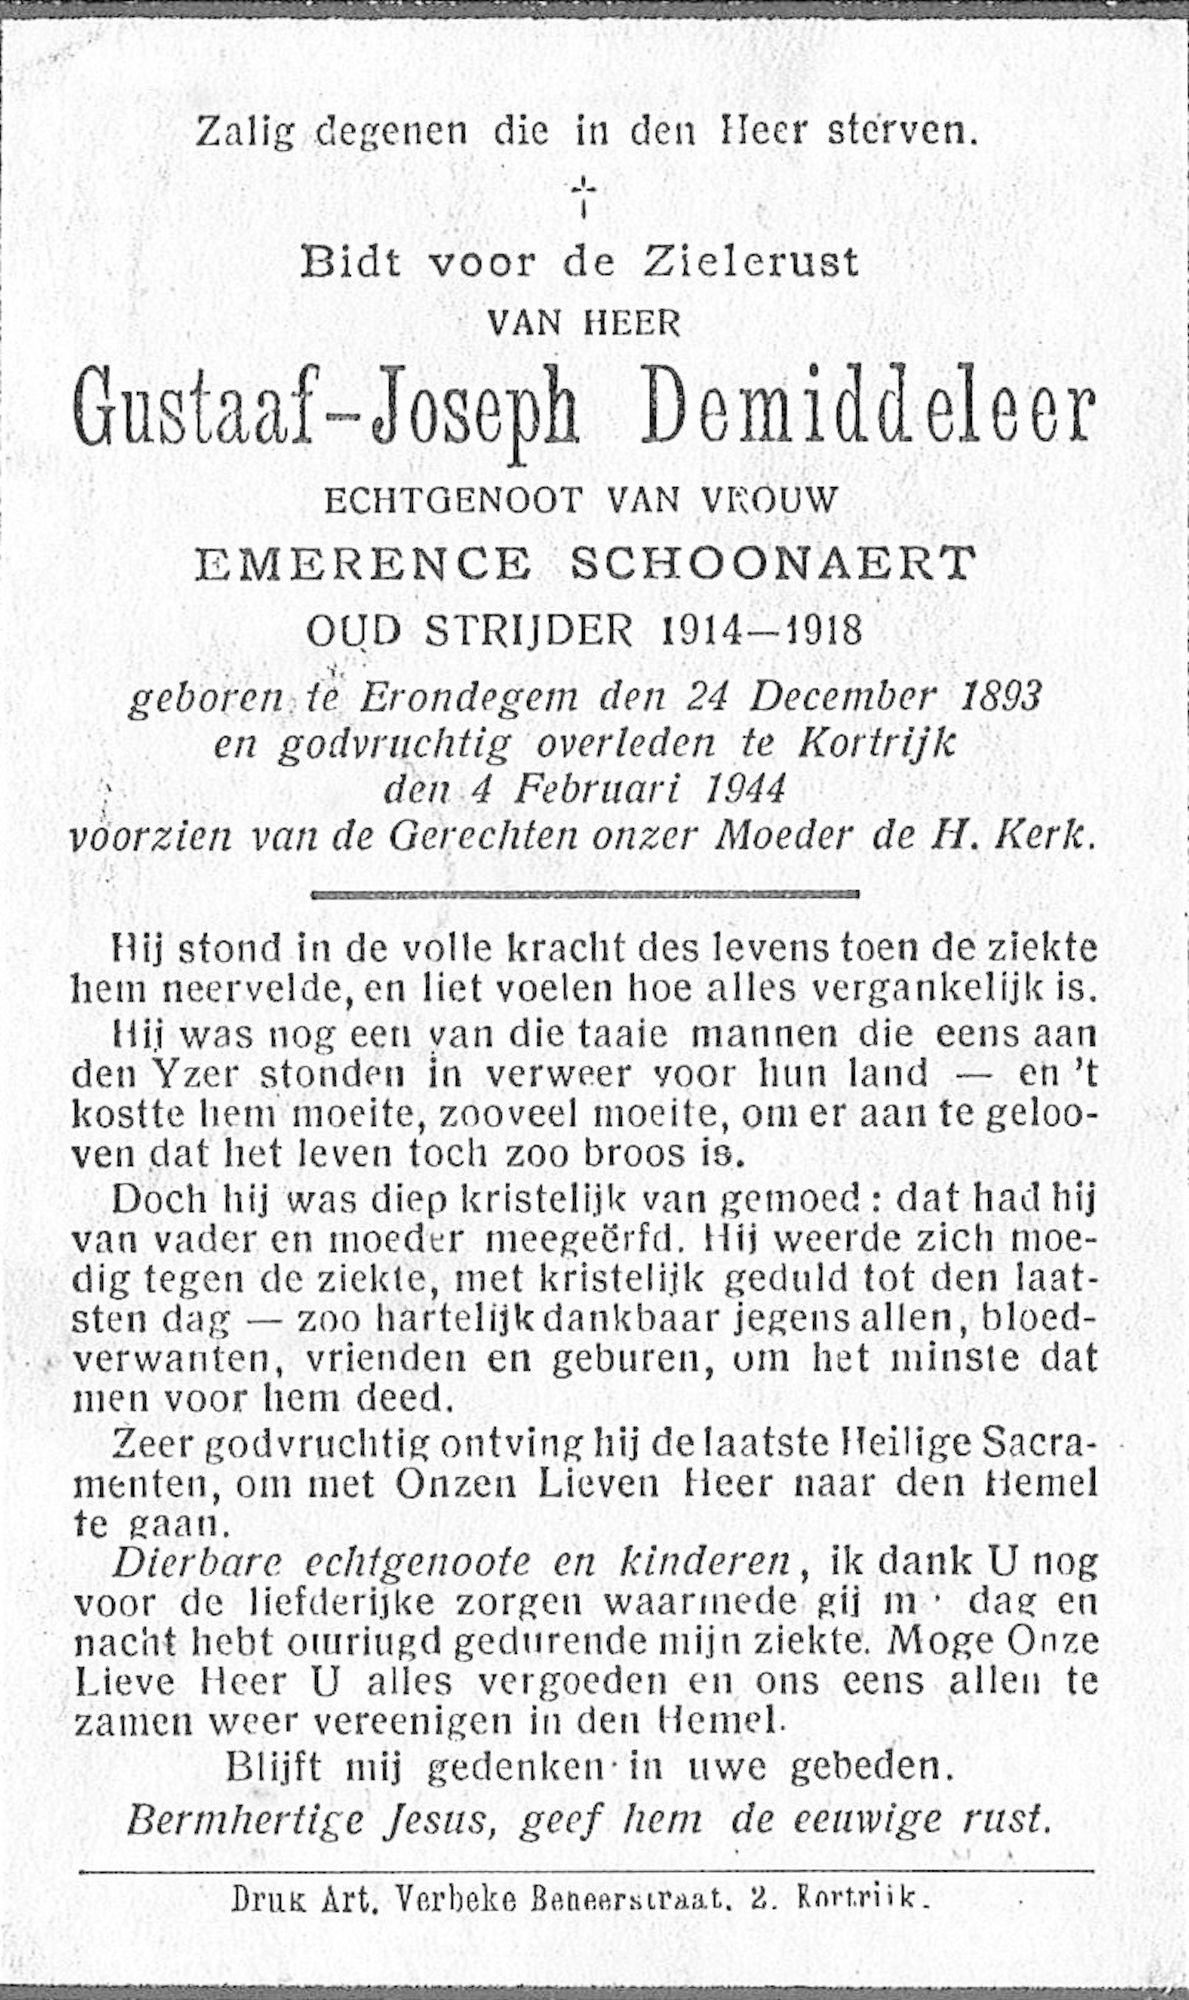 Gustaaf-Joseph Demiddeleer